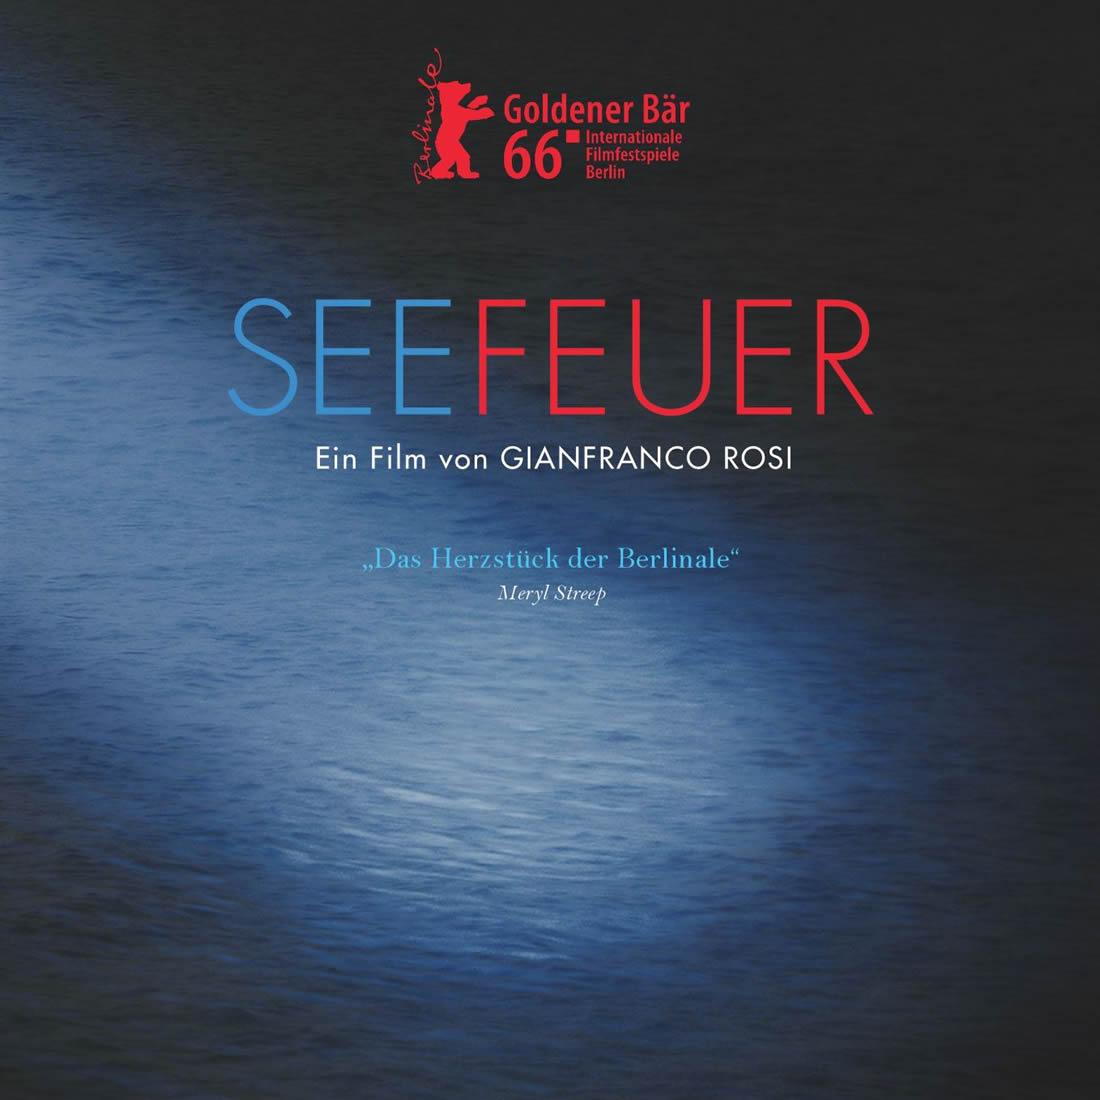 Seefeuer Film